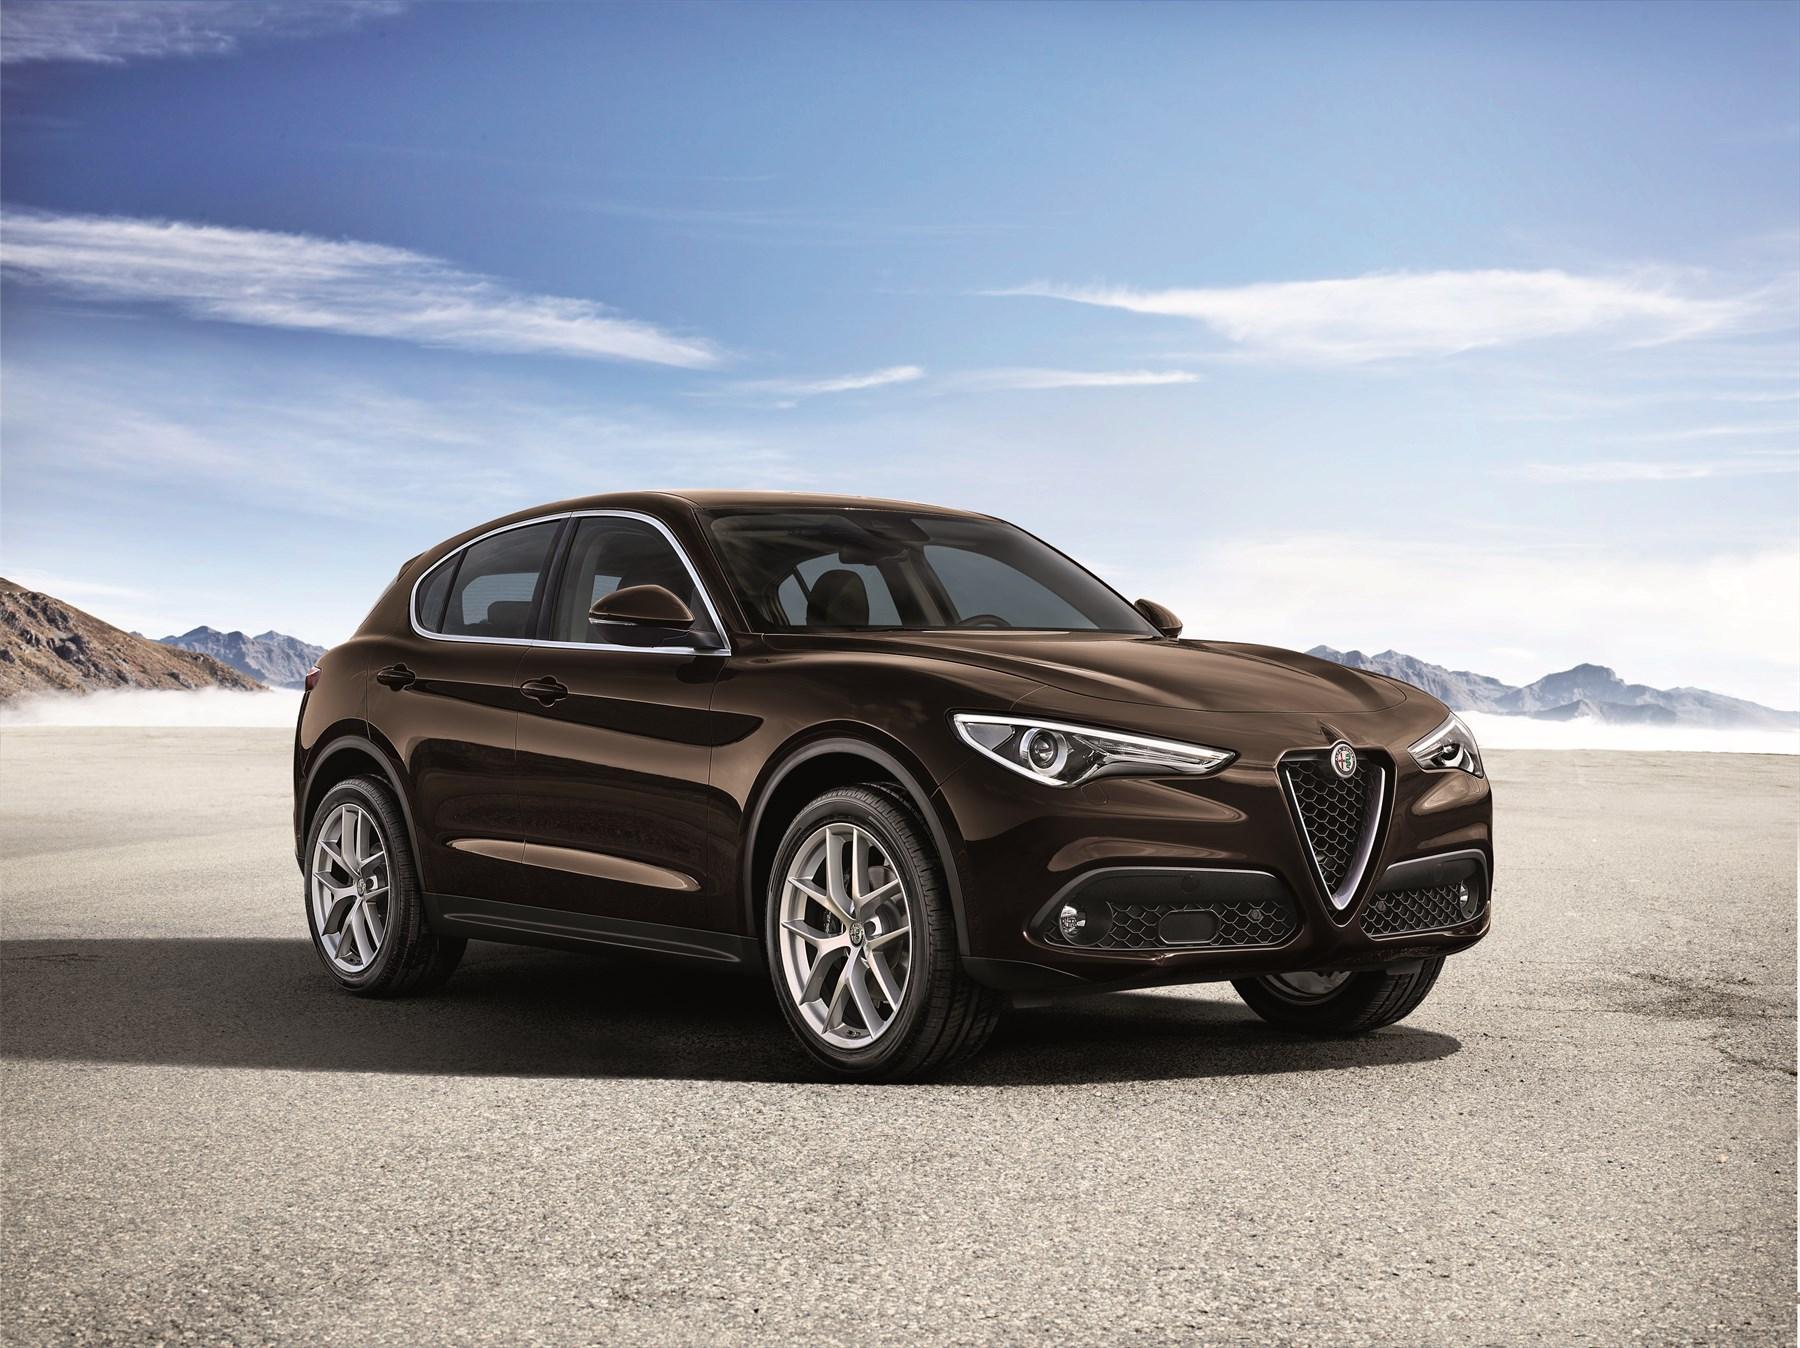 The First Alfa Romeo Suv The Stelvio Traction Online Magazine